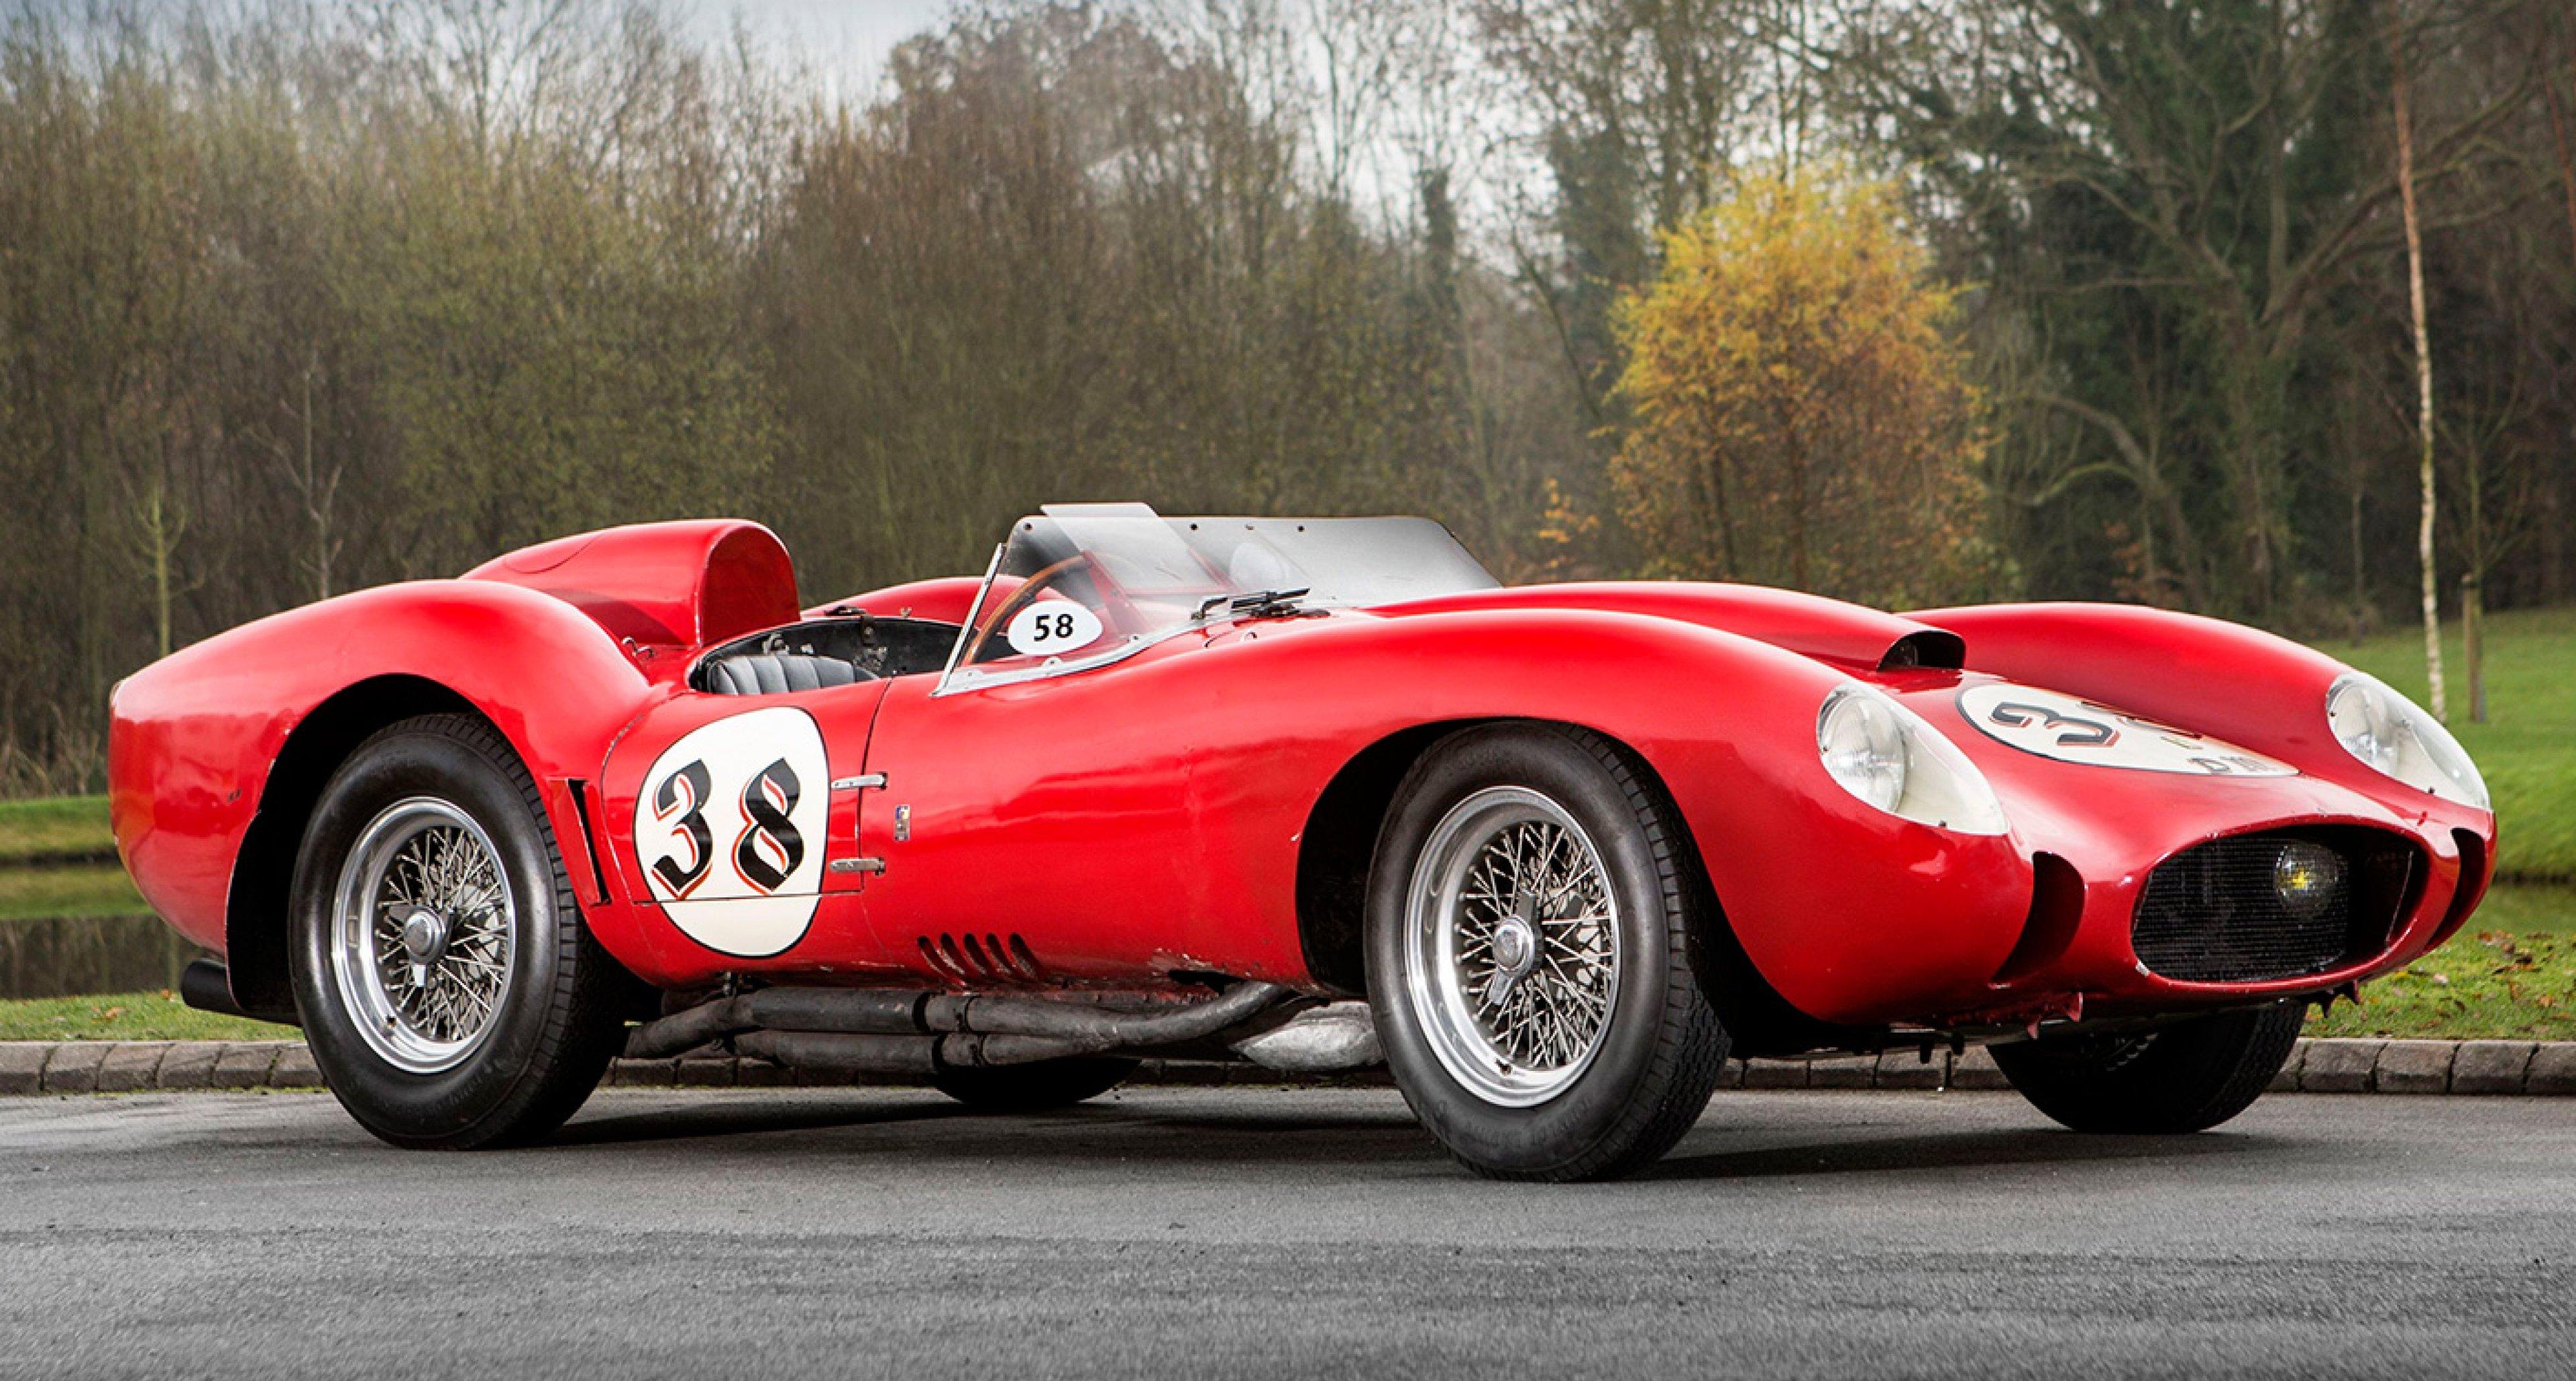 Tom Hartley Sells 1957 Ferrari Testa Rossa For World Record